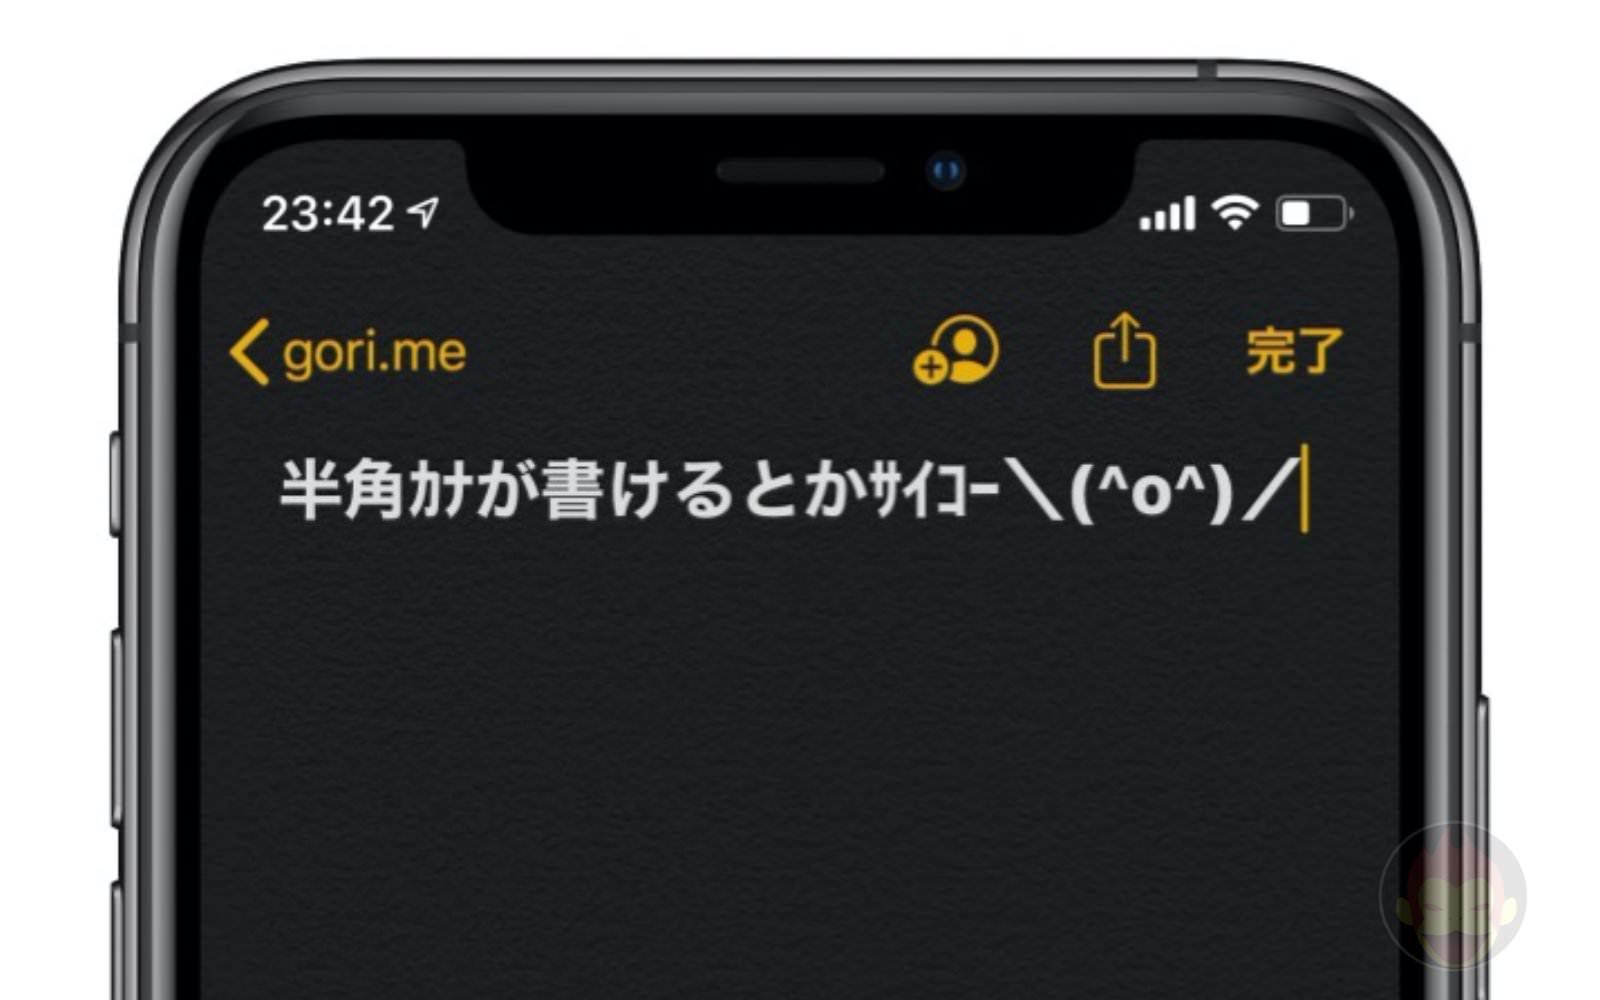 Hankaku-Input-for-iOS13-iphone.jpg